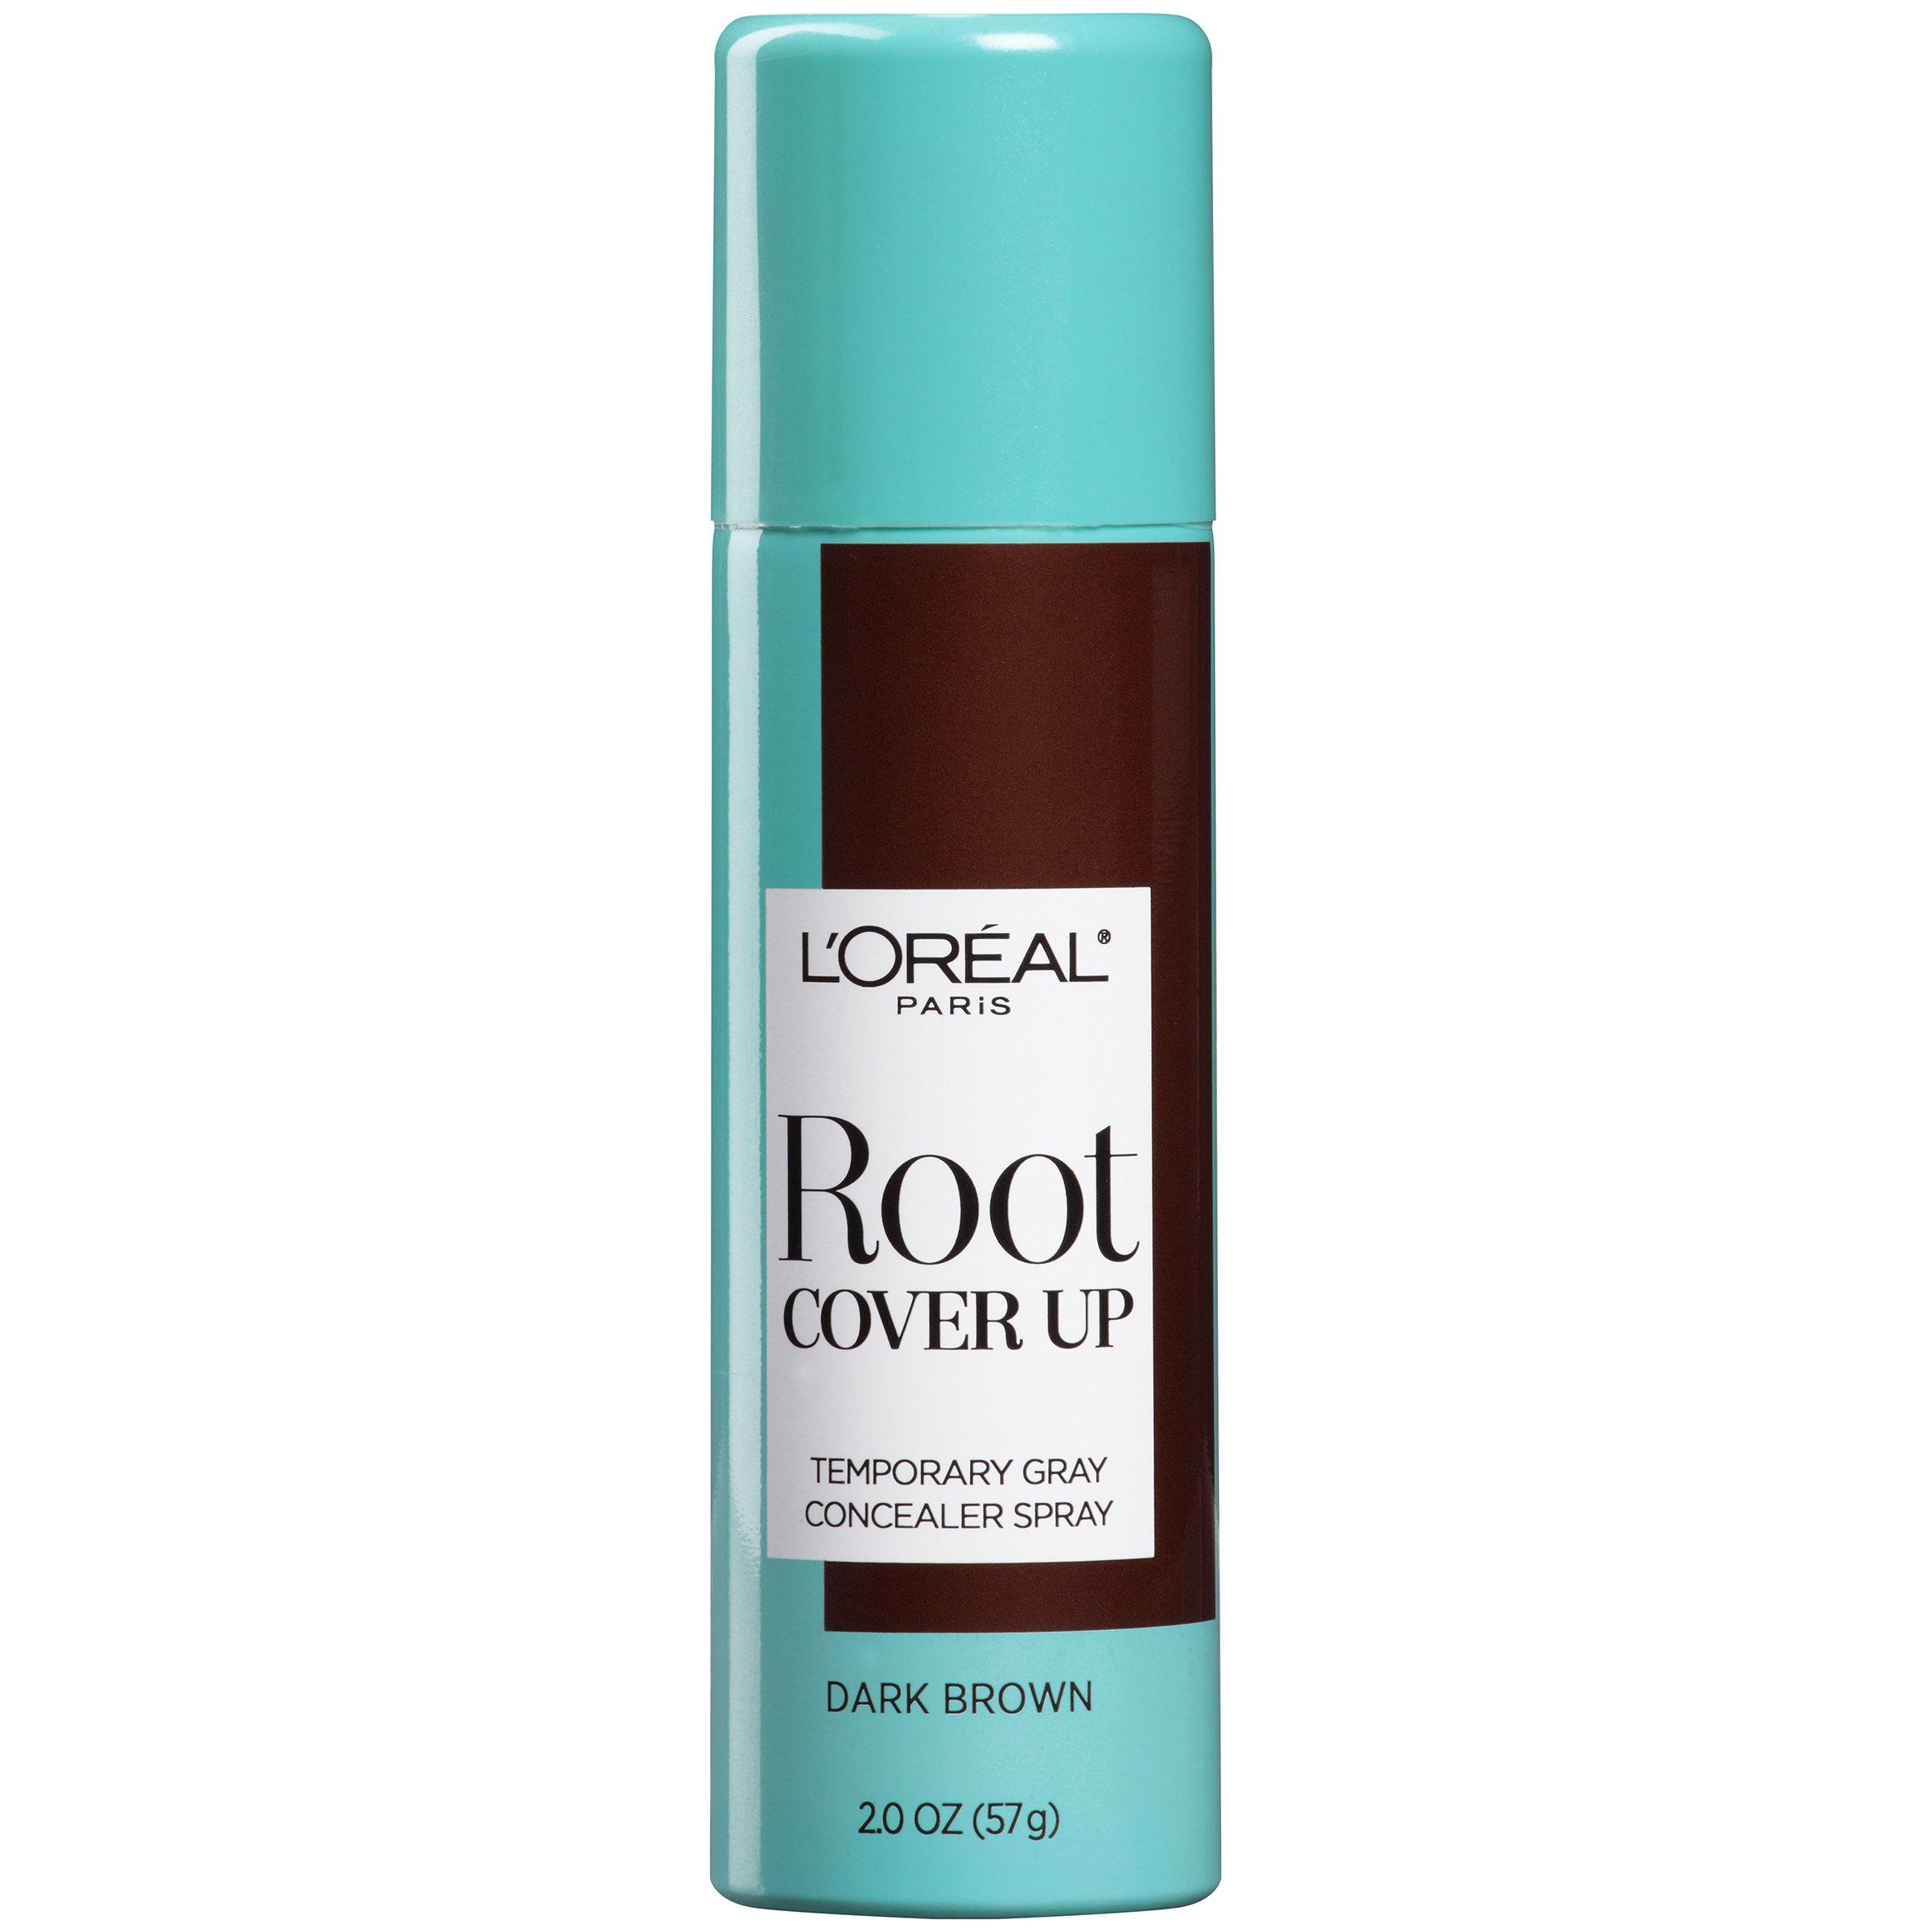 L'Oreal Paris Magic Root Cover Up Gray Concealer Spray, Dark Brown, 2 oz.(Packaging May Vary) by L'Oreal Paris